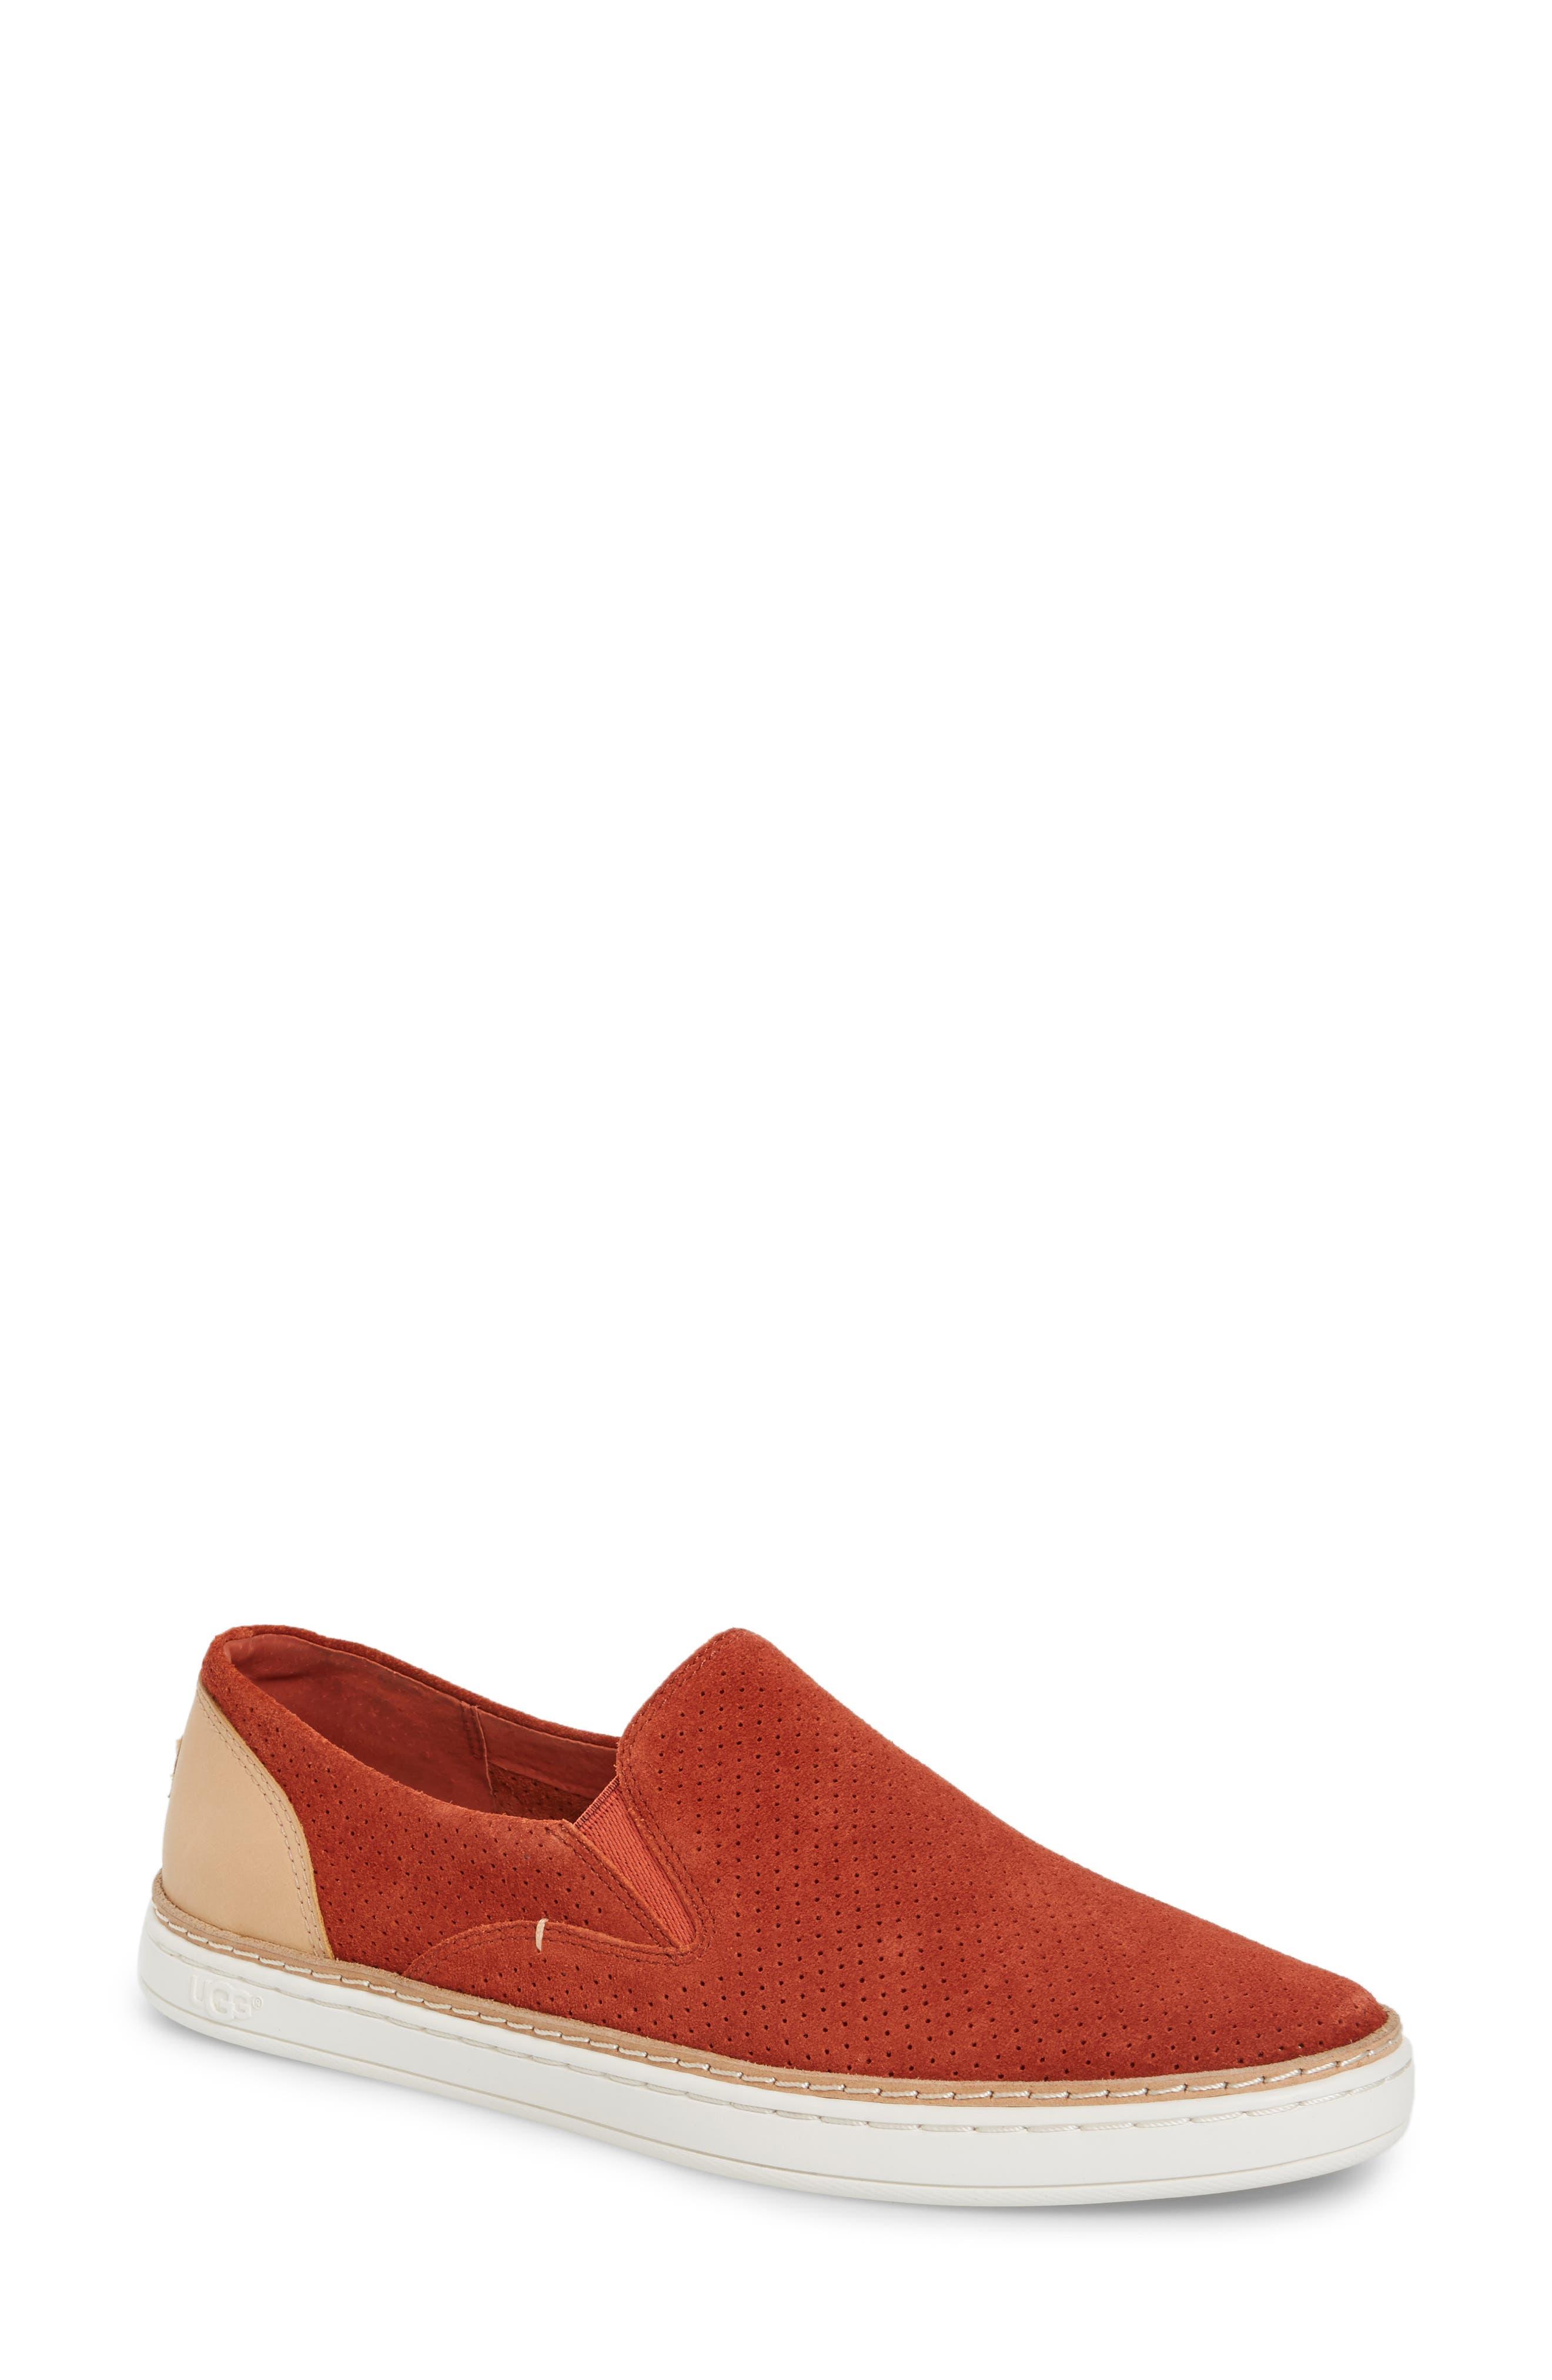 Adley Slip-On Sneaker,                         Main,                         color, Paprika Suede